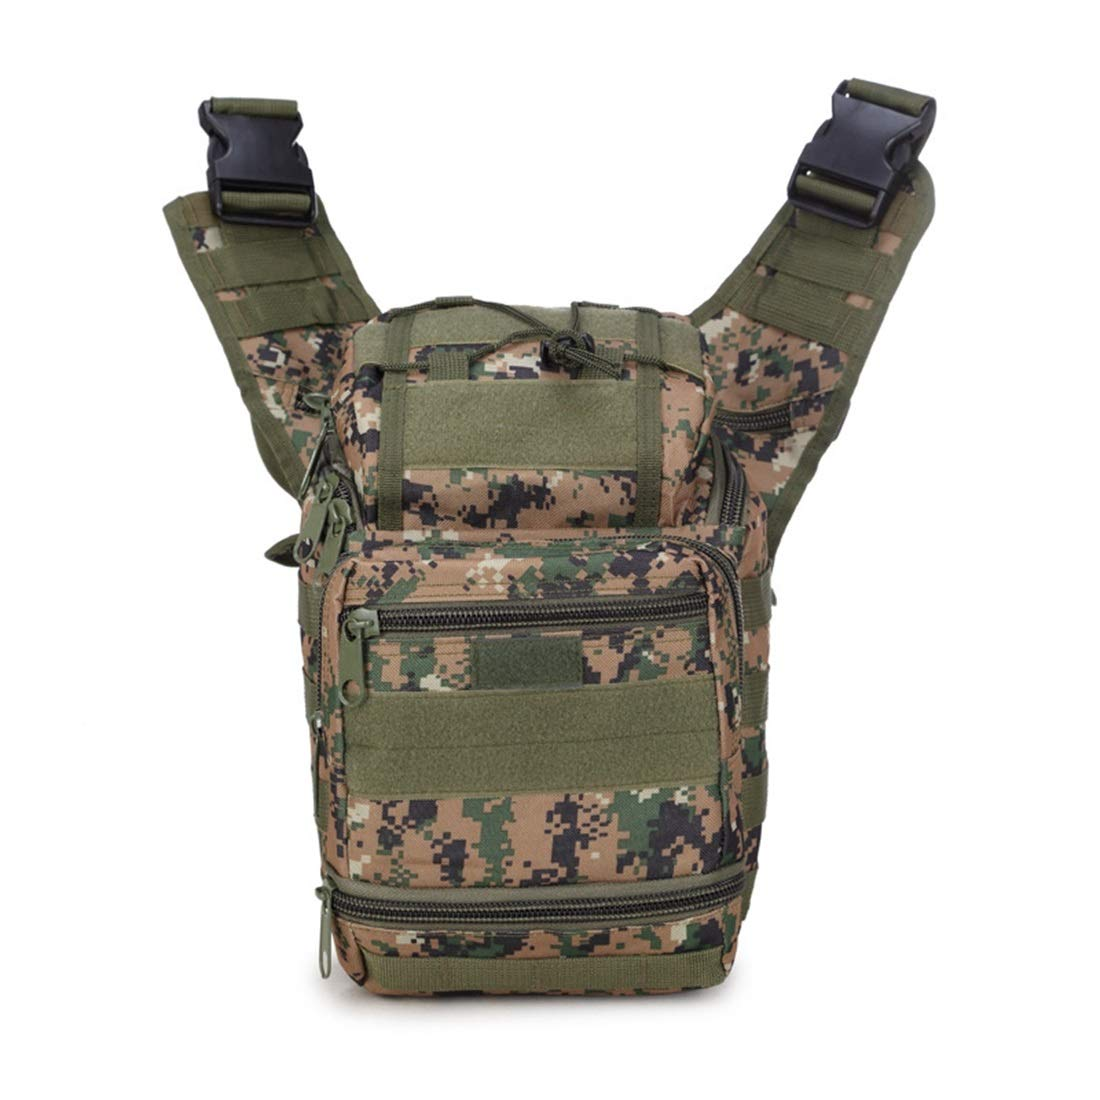 RABILTY Travel Fanny Bag Waist Pack Sling Pocket Super Lightweight for Travel Cashiers Box,Waist Pack Crossbody Bag for Men Boy Color : Jungle Digital